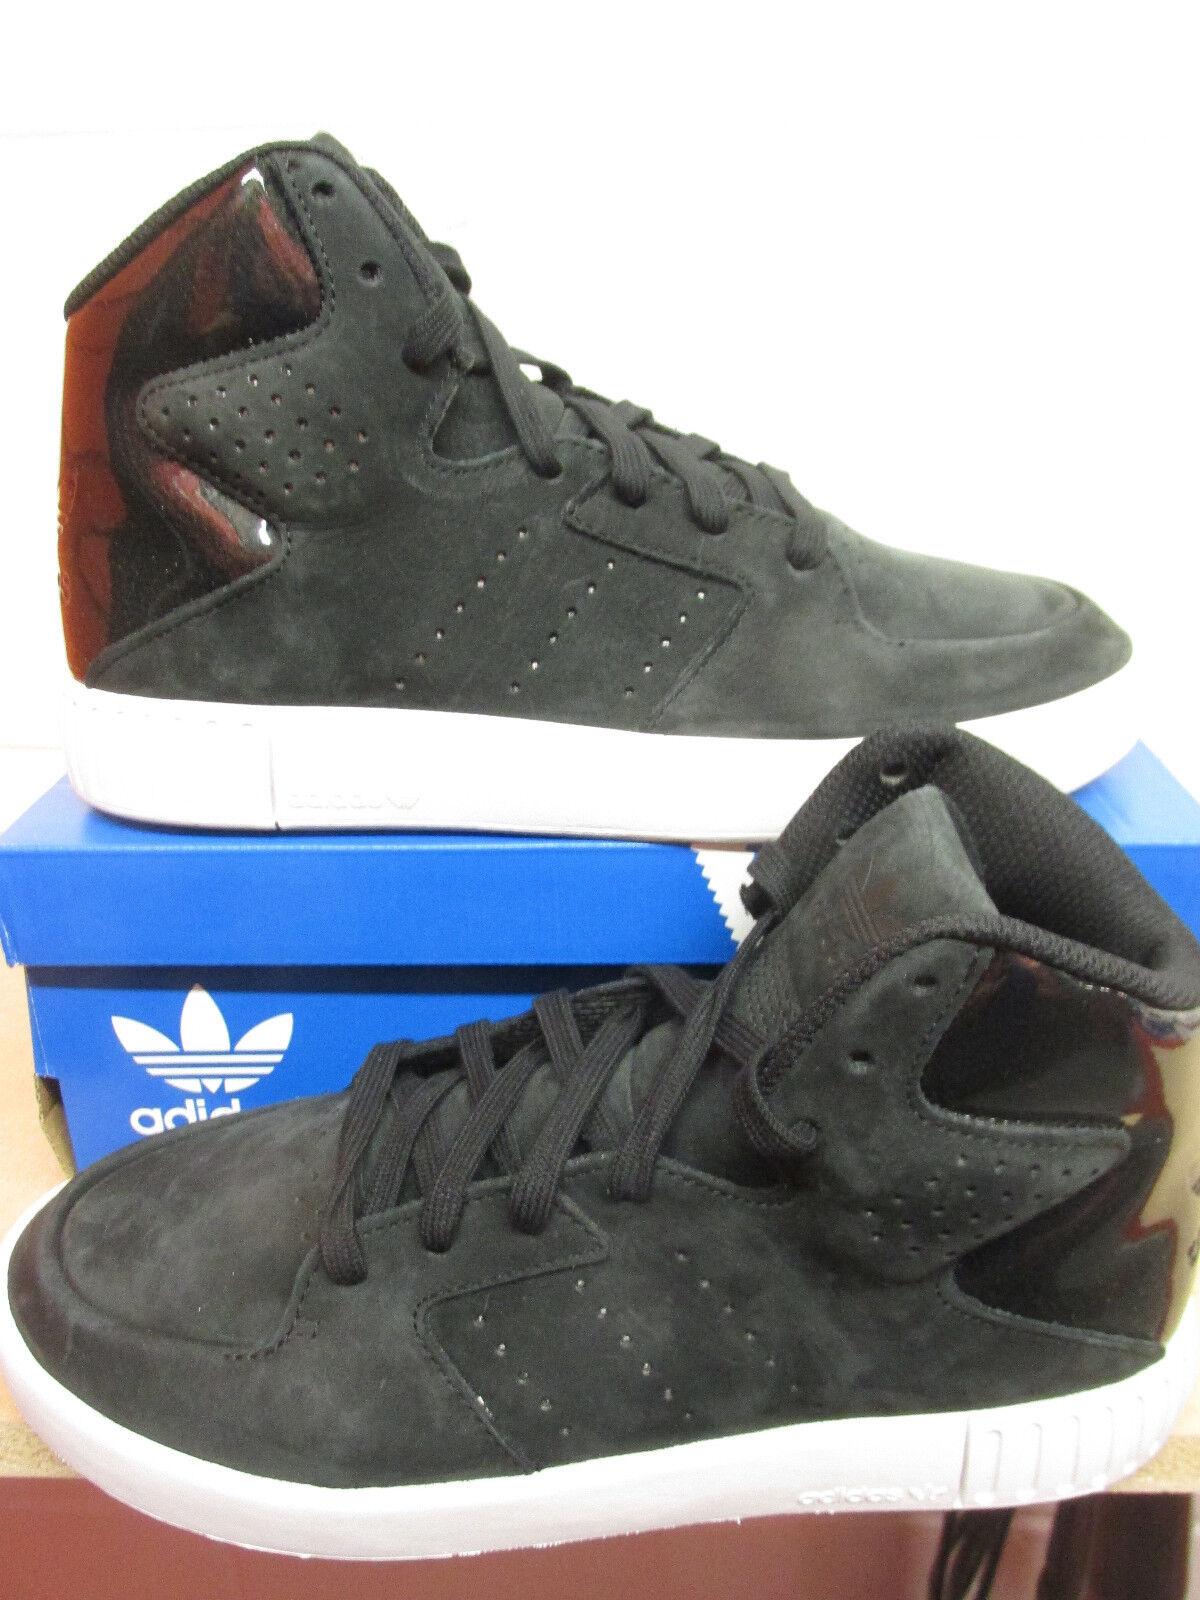 Adidas Tubular Invader 2.0 Womens BA7508 Hi Top Trainers Sneakers